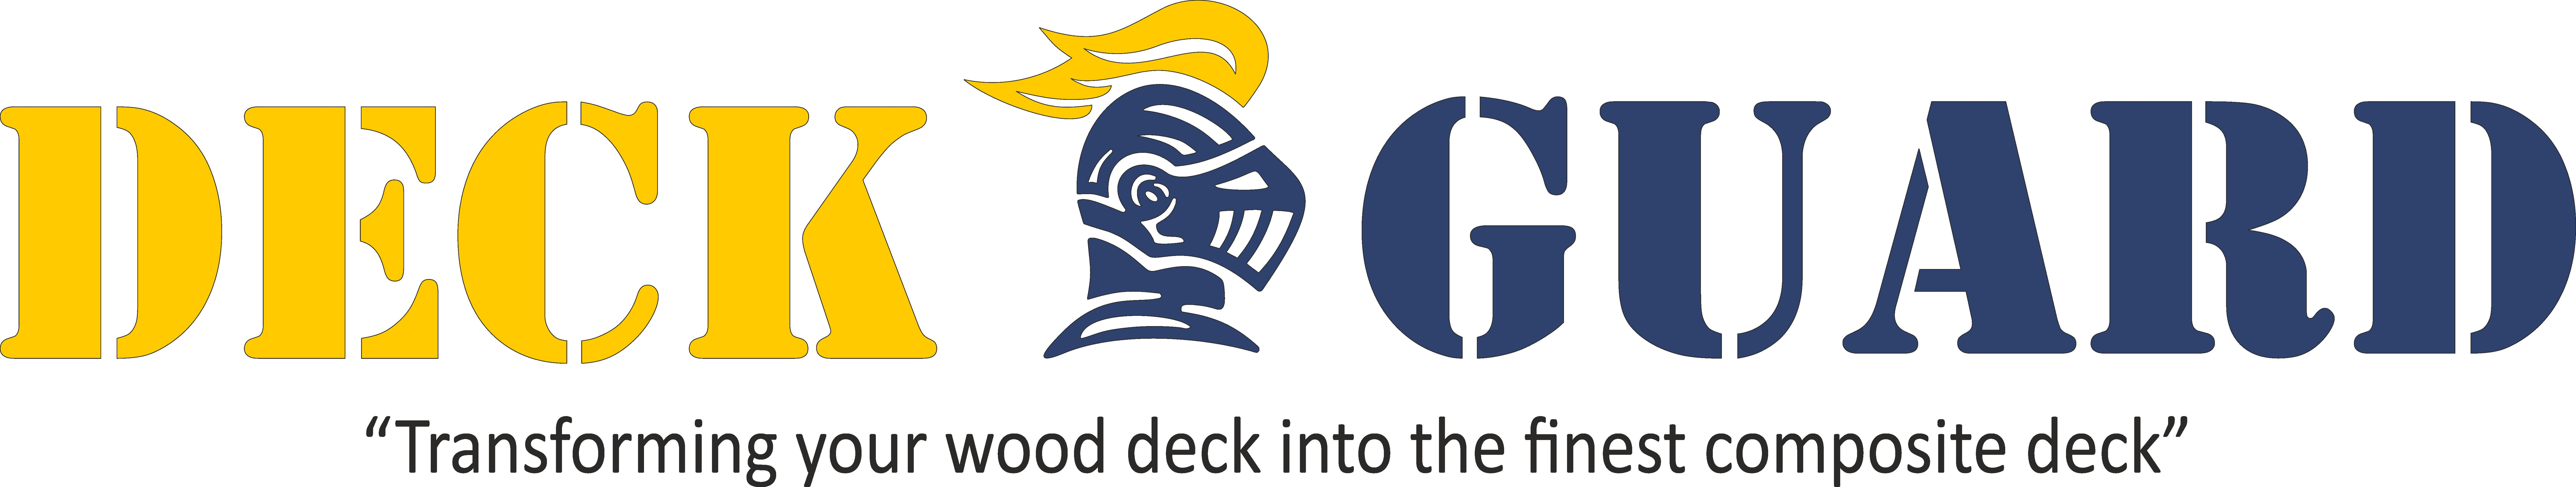 Deck GuardDeck restoration, repair, protection, & installation in